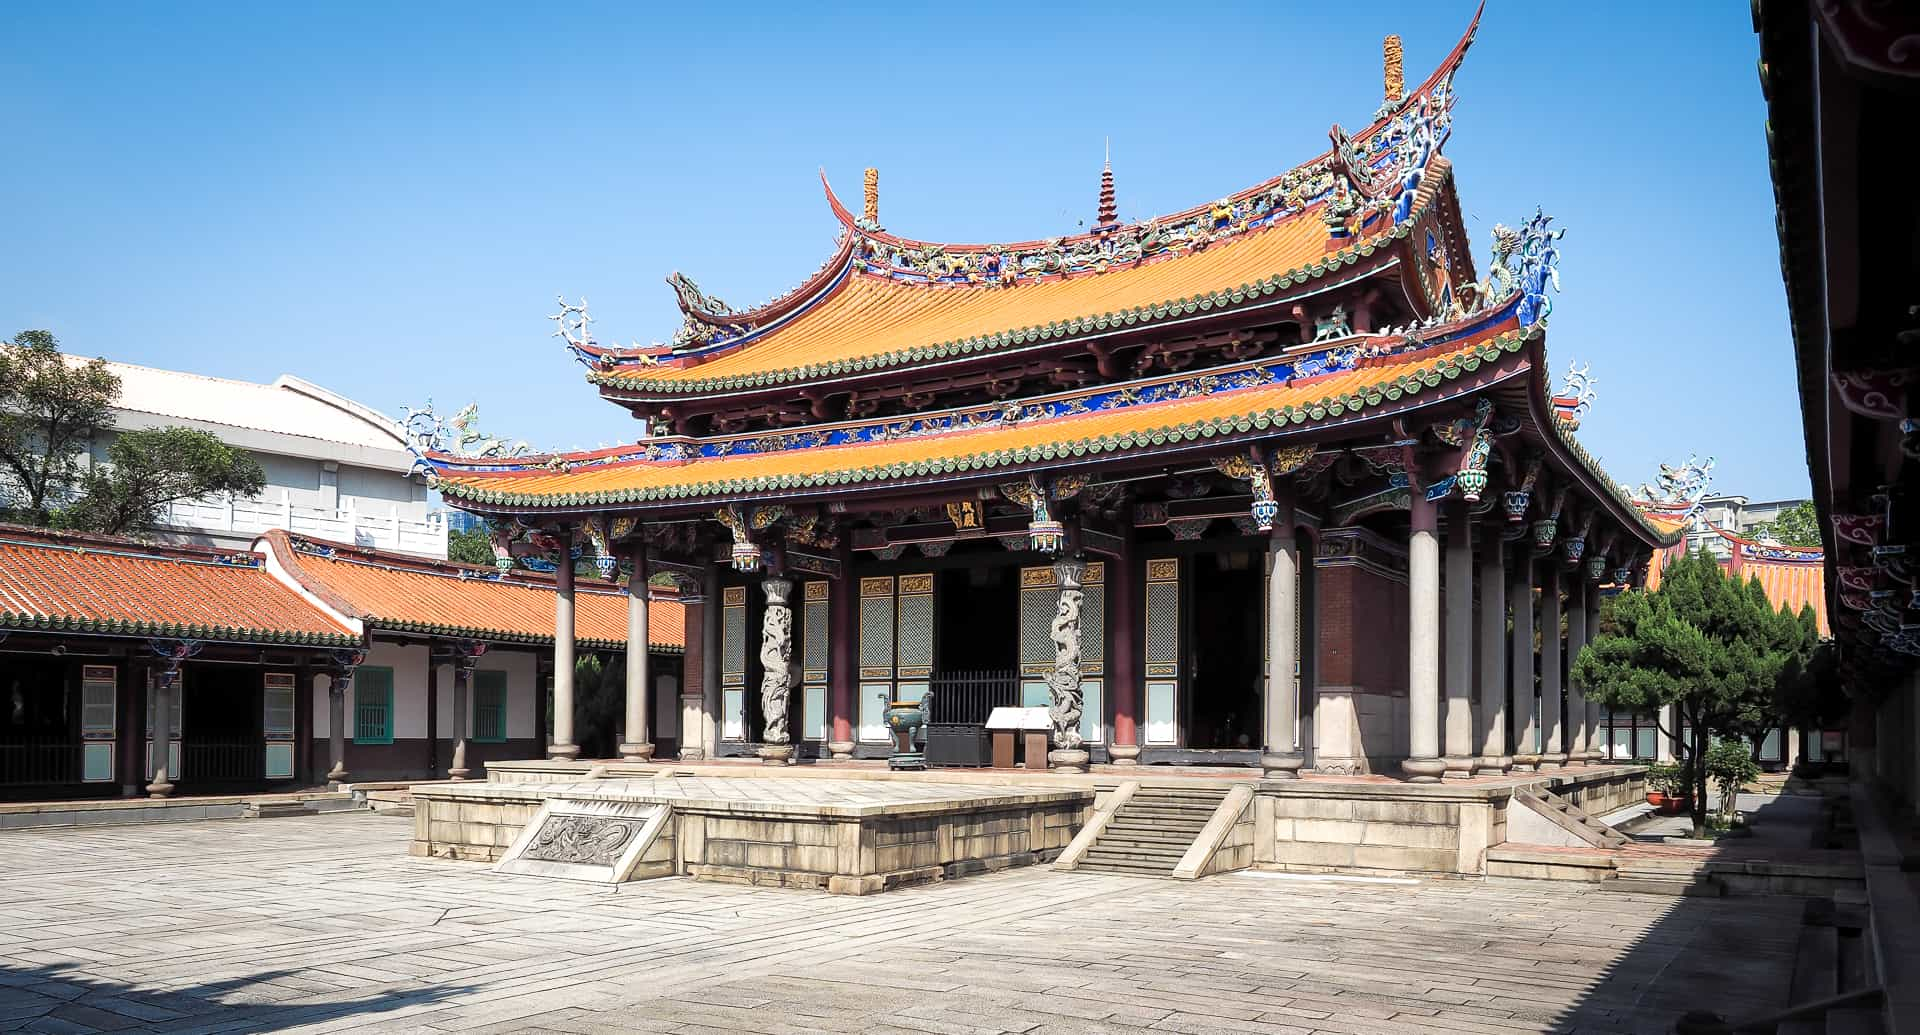 Visiting Taipei & Taiwan in September 2020